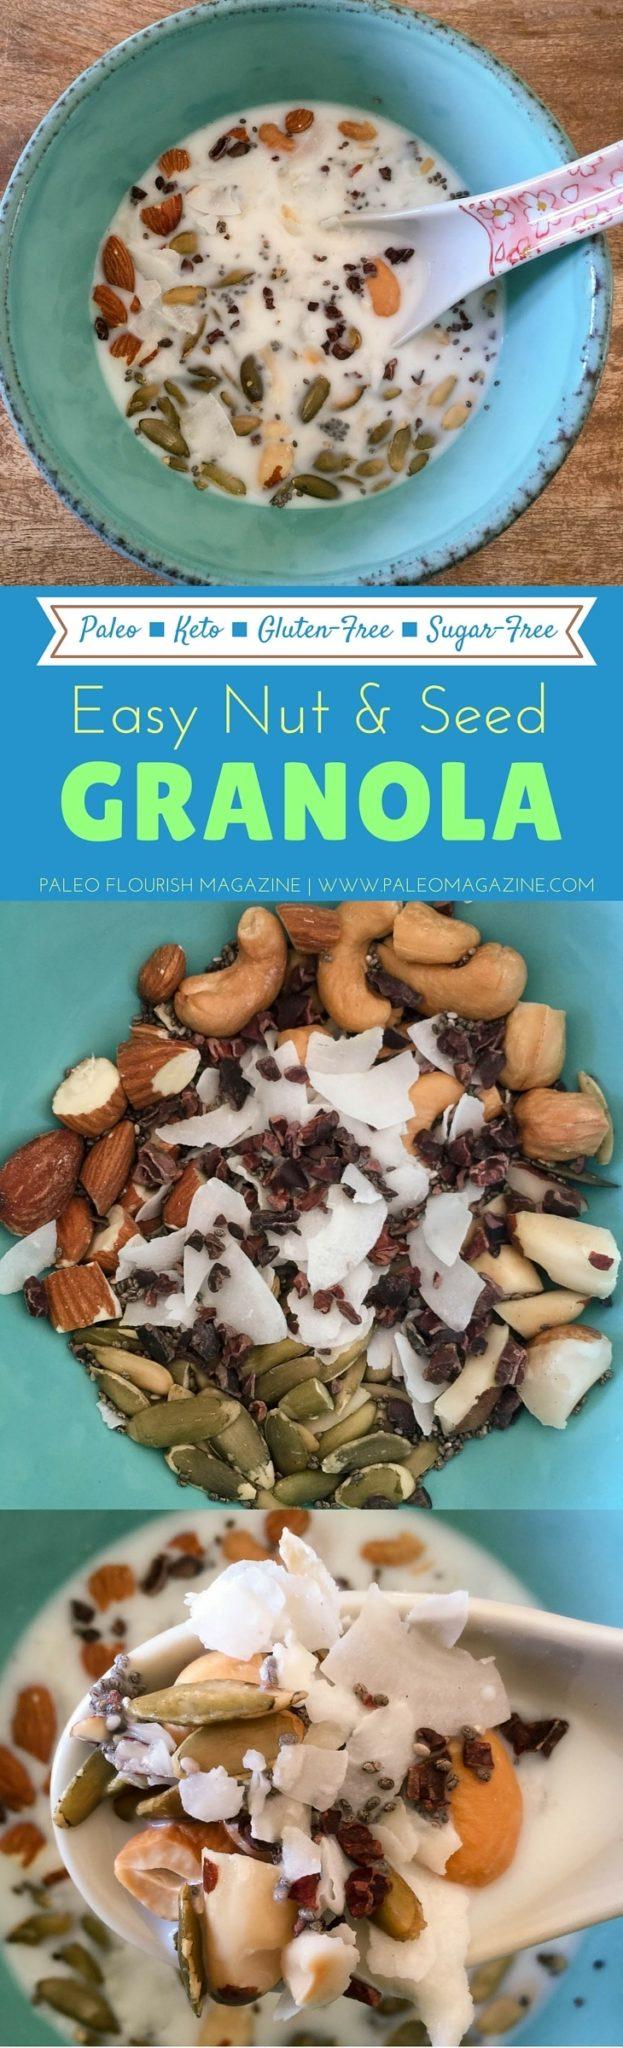 Easy Nut & Seed Keto Granola Recipe (Paleo, Sugar-Free)